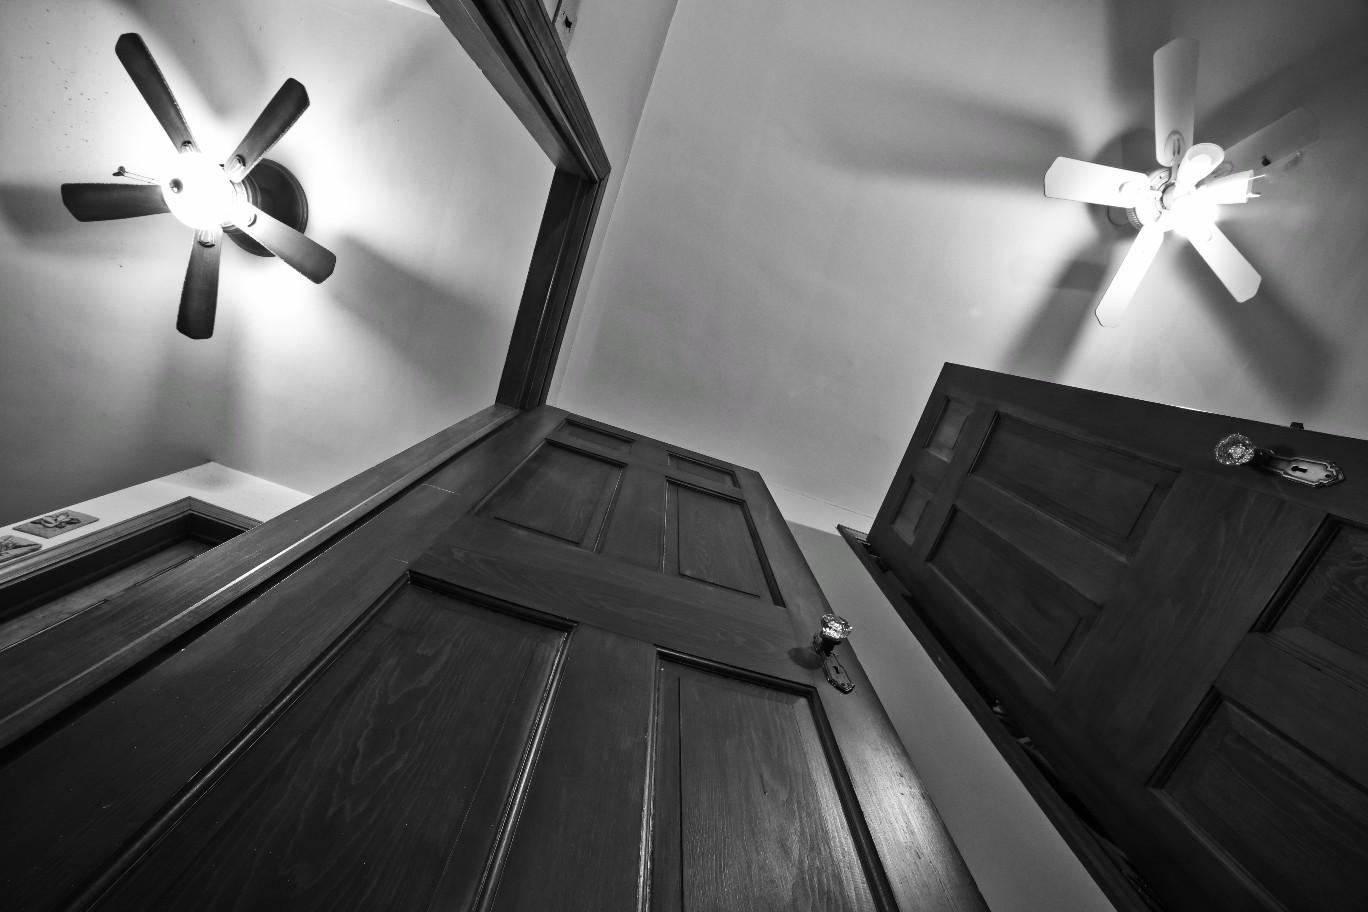 Doors-01_copy_1368x912.jpeg